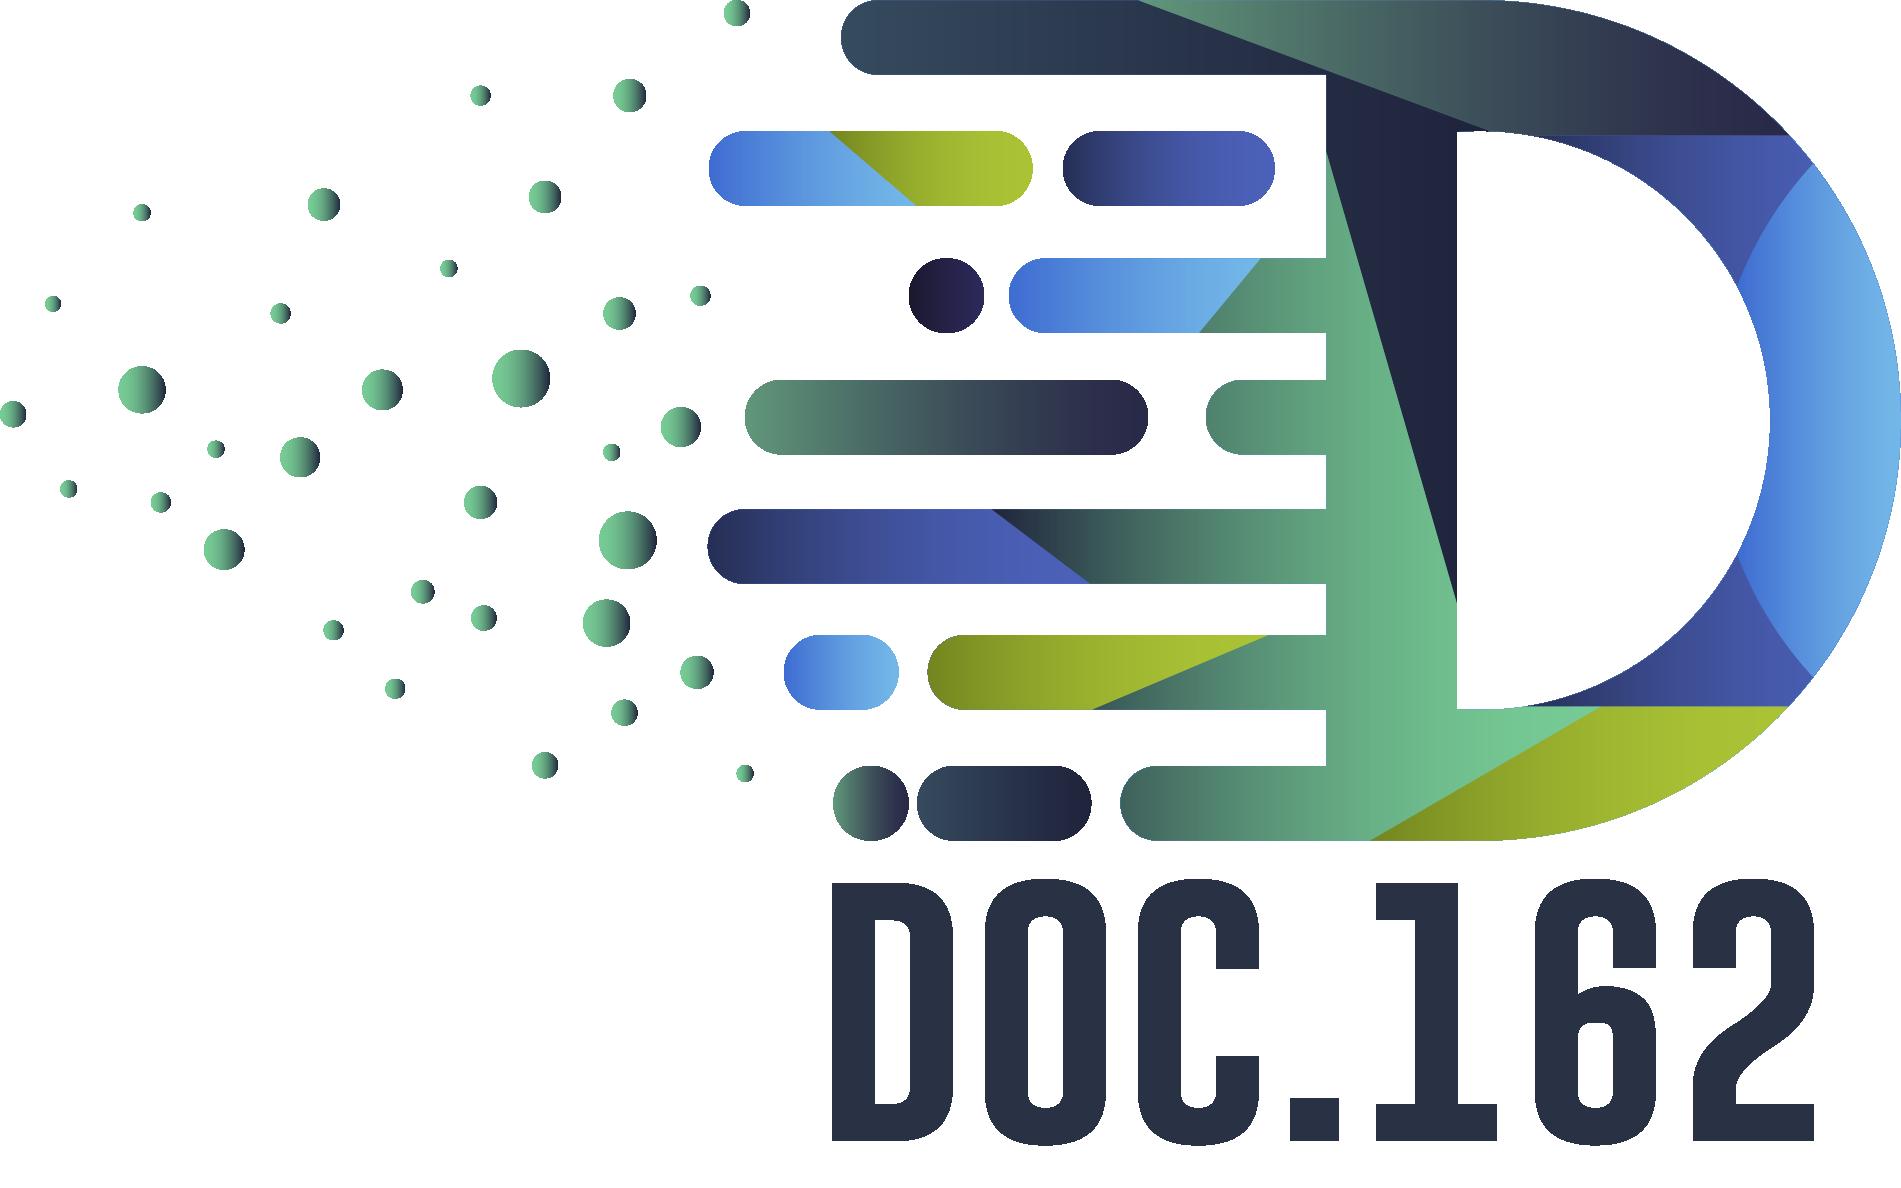 Doc 162